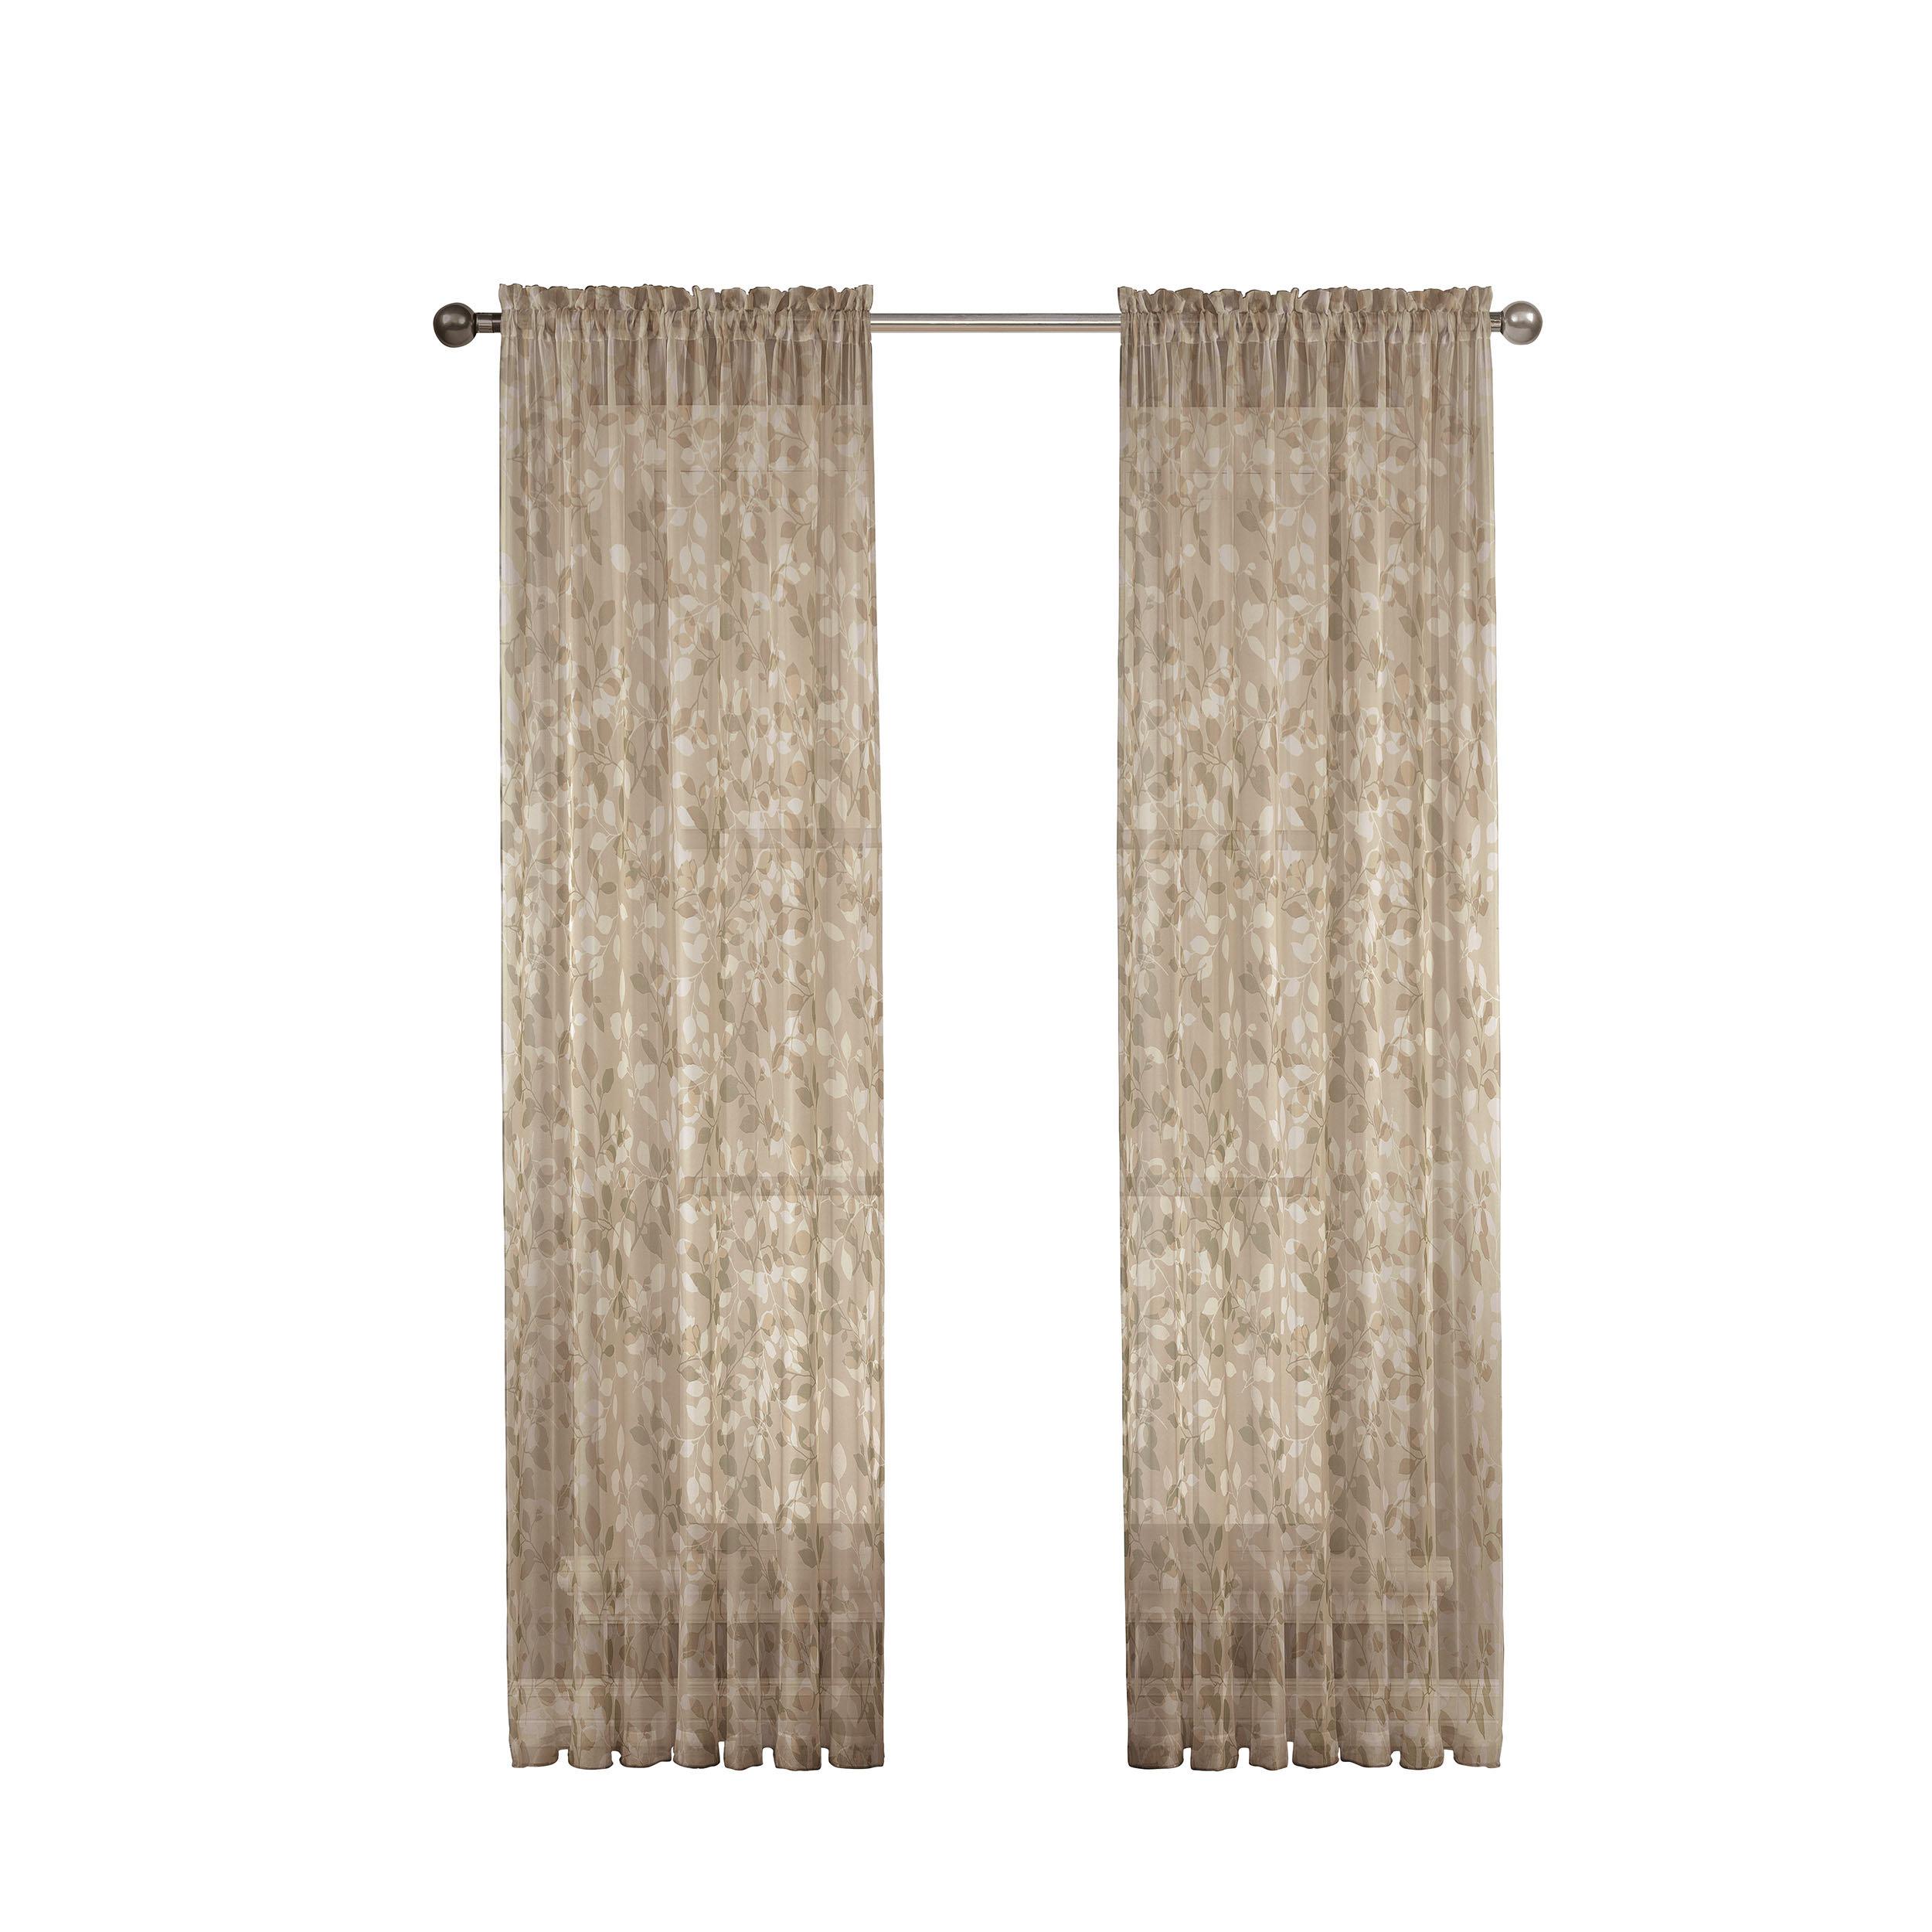 Window Elements Pinehurst Naturefloral Sheer Rod Pocket Single Curtain Panel